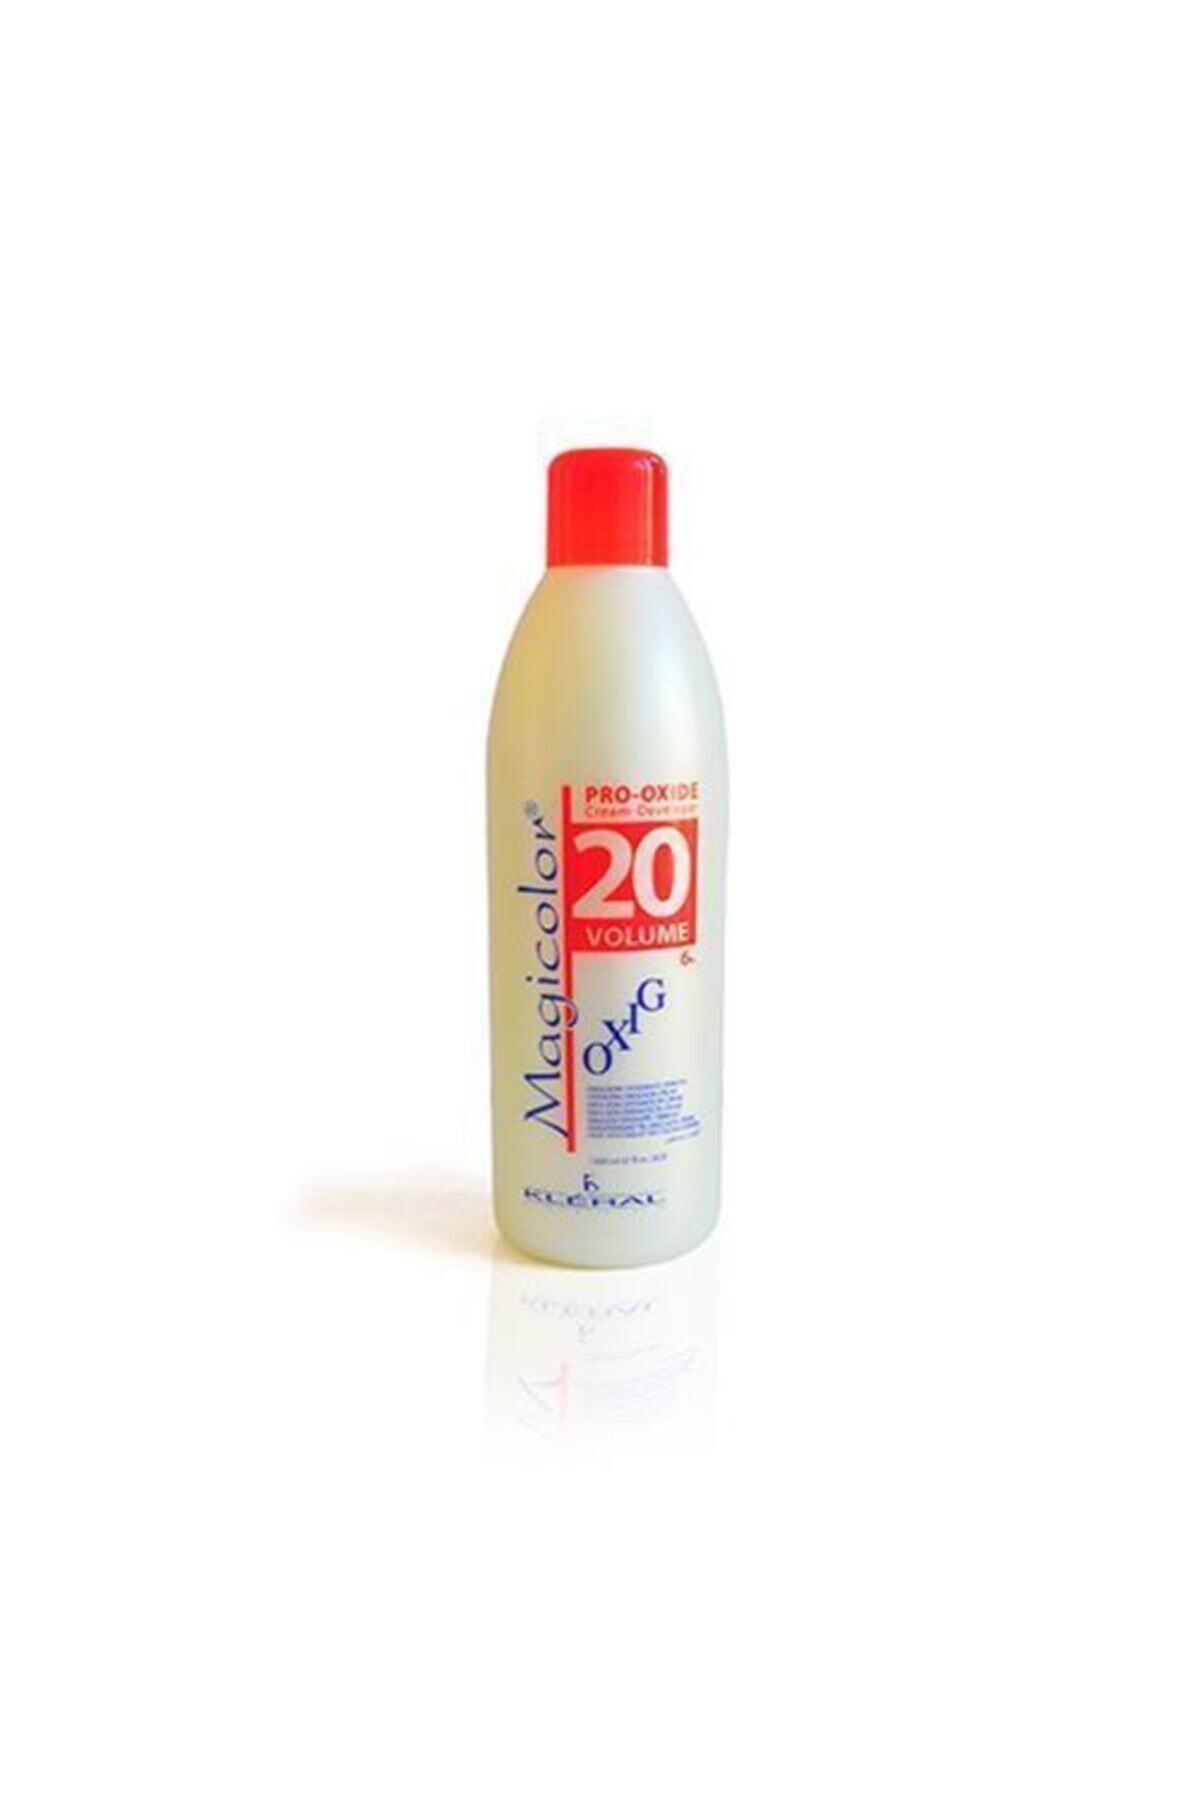 OXIDE Kleral Magicolor Oxıg Oxidant 6% 20 Vol 1000ml 1